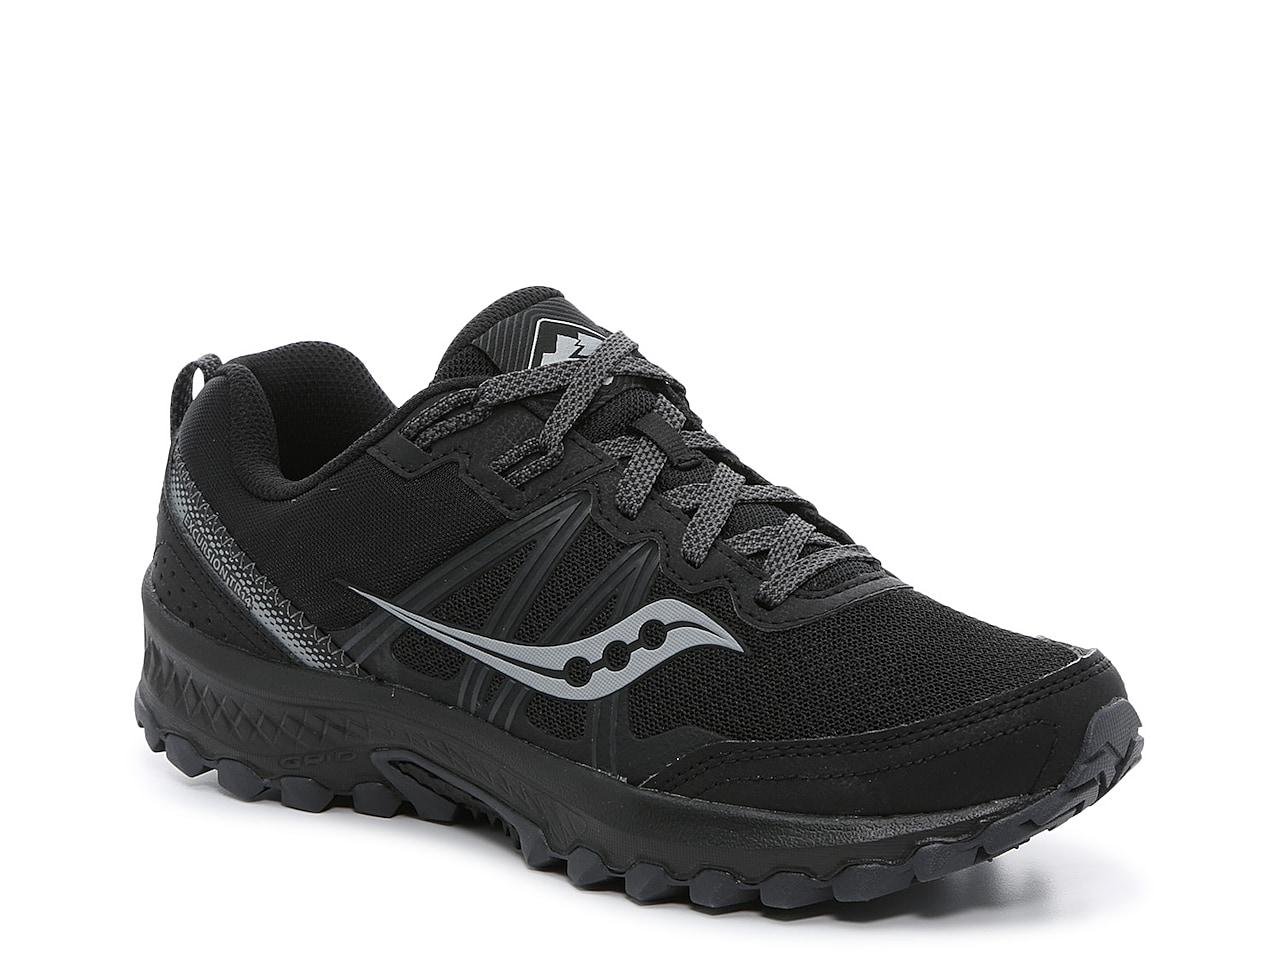 Saucony Excursion TR 14 Trail Running Shoe - Men's